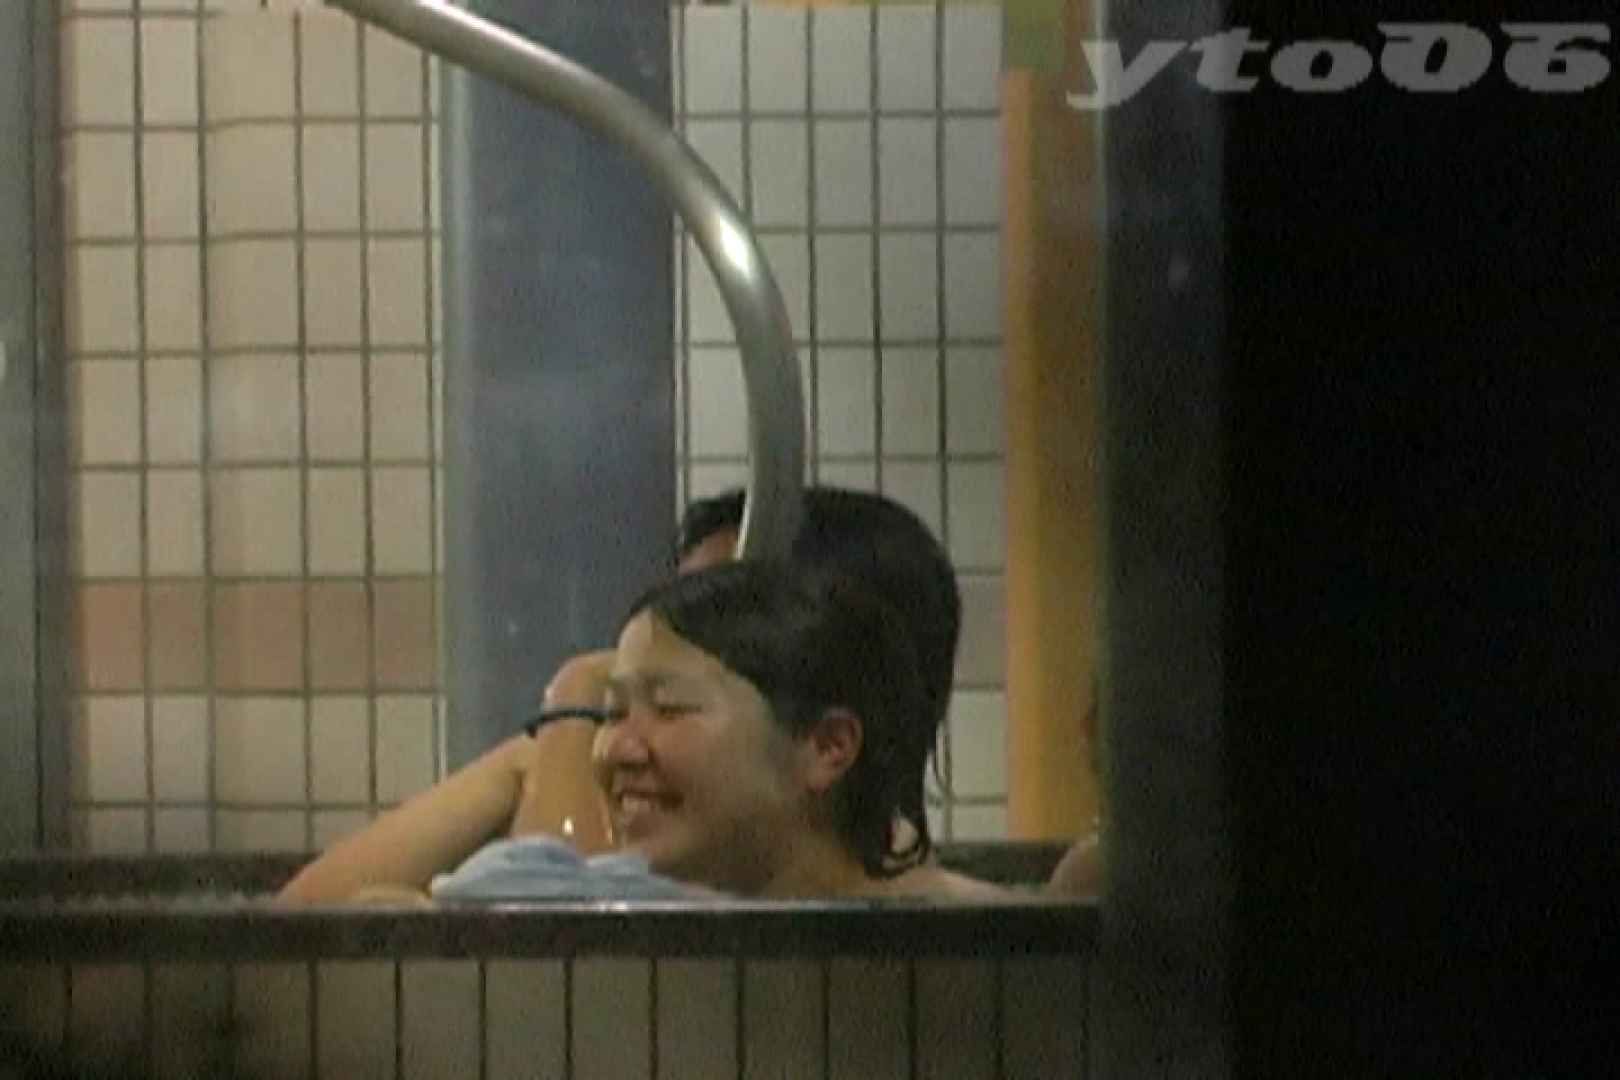 ▲復活限定▲合宿ホテル女風呂盗撮 Vol.34 合宿 AV無料 94画像 23